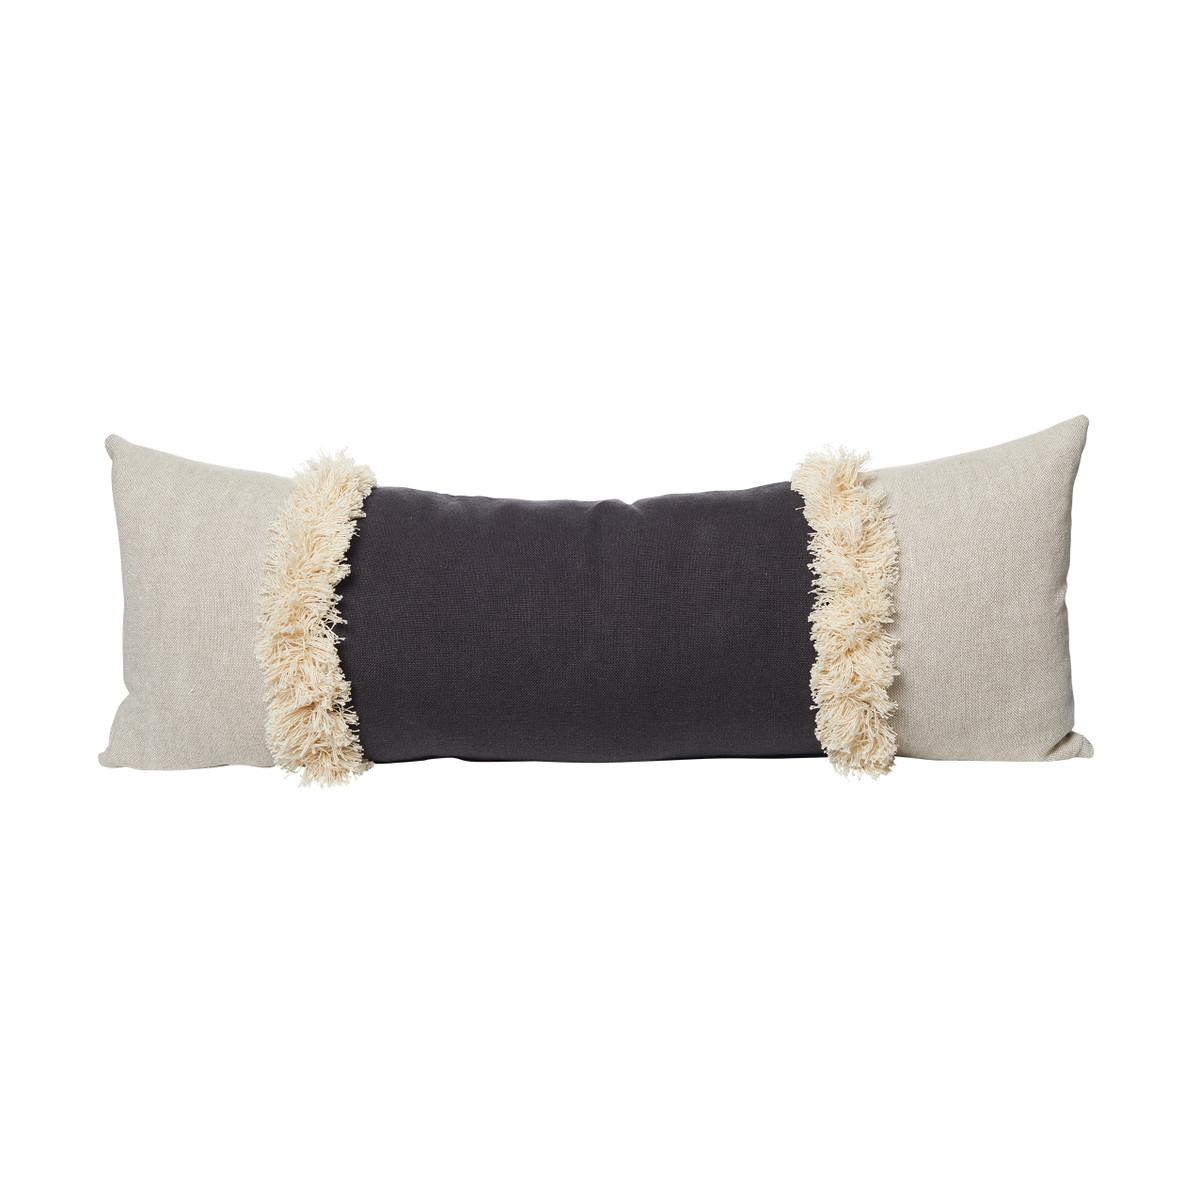 Muse Linen Lumbar Fringe Pillow Carbon - Front